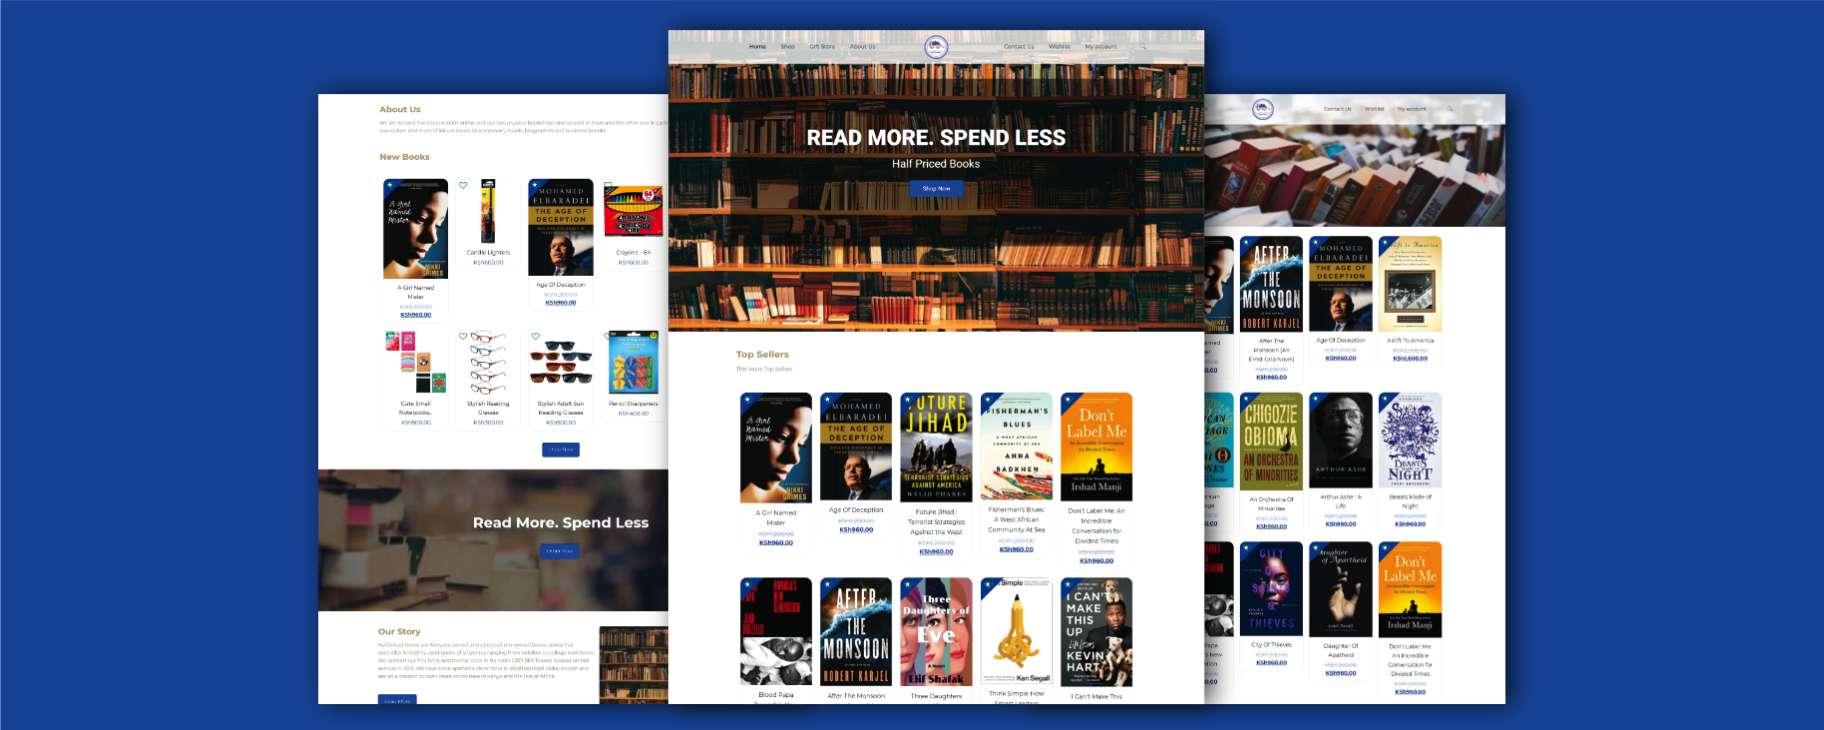 HalfPriced Books_13